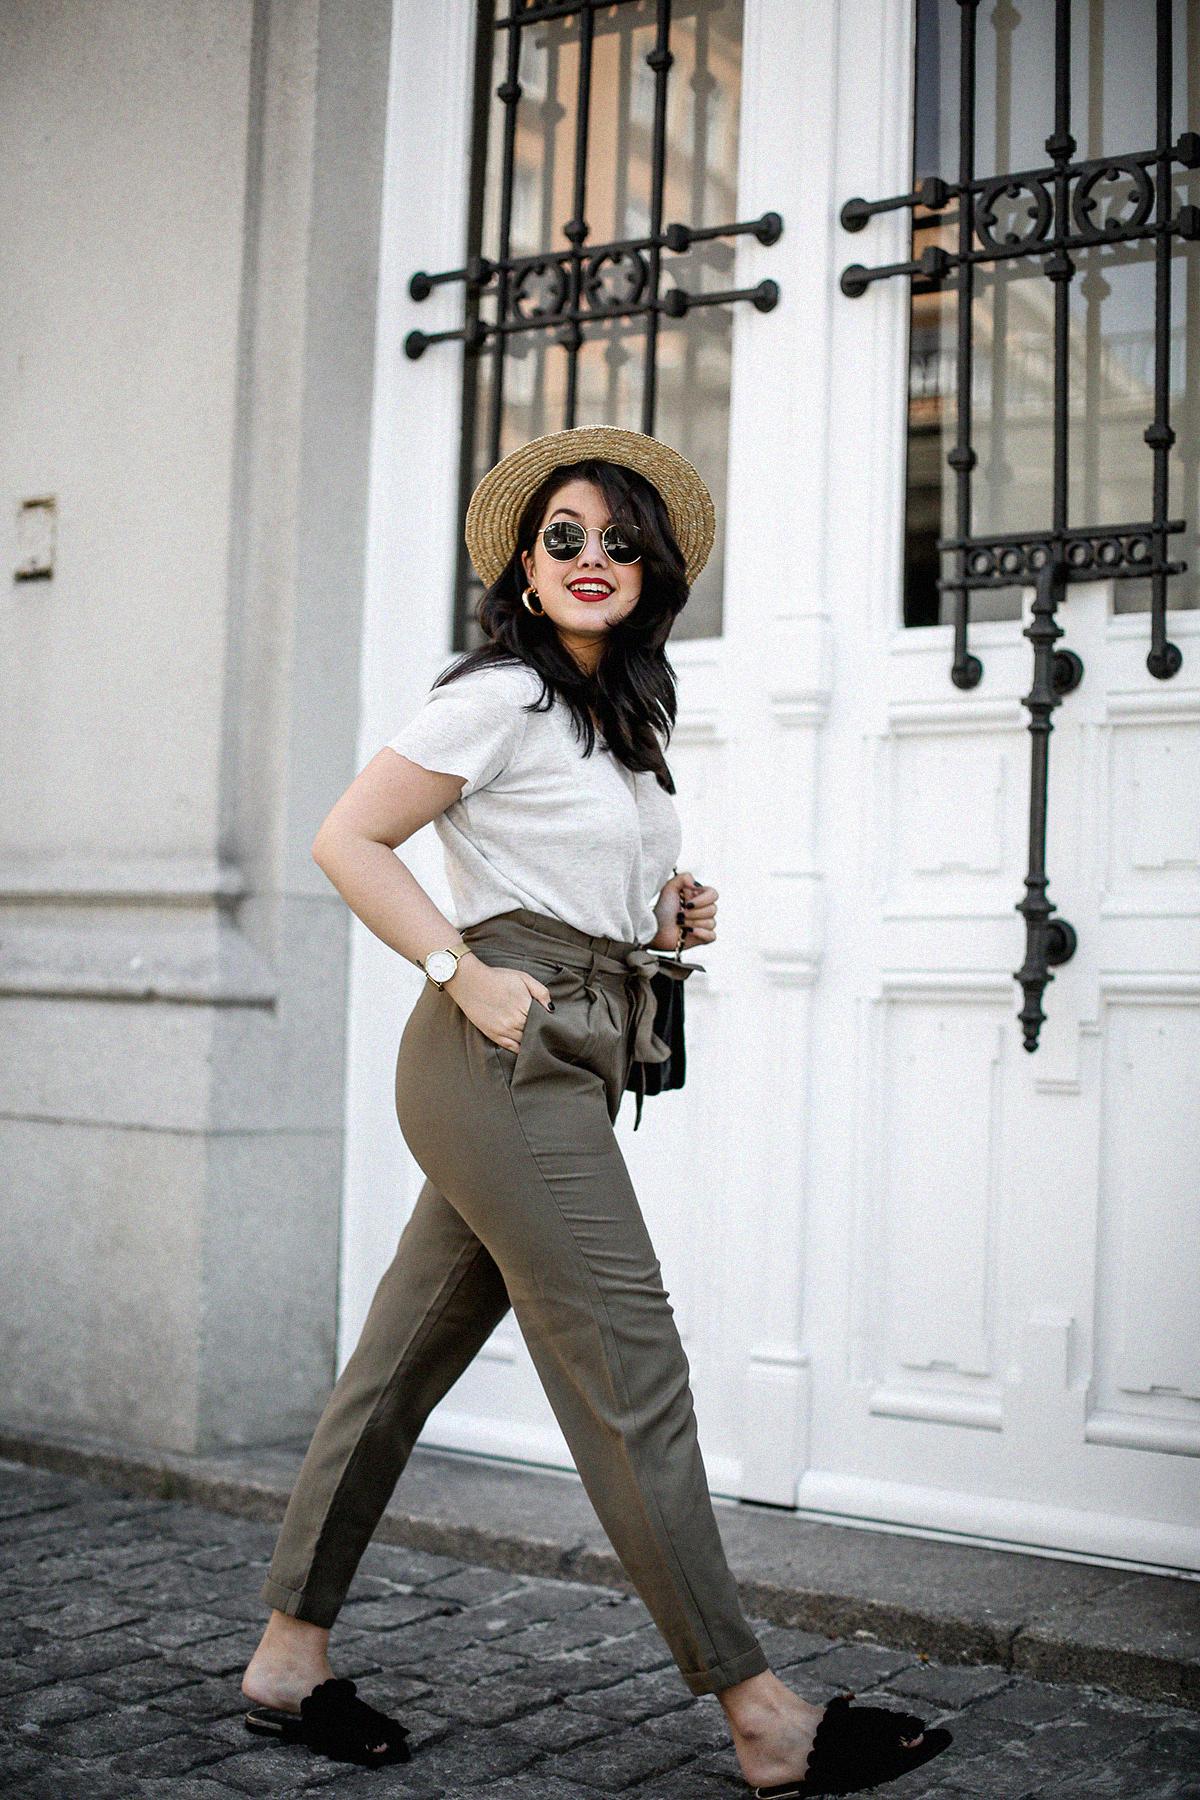 pantalones-verdes-altos-palas-borlas-zara-canotier-look-myblueberrynightsblog7